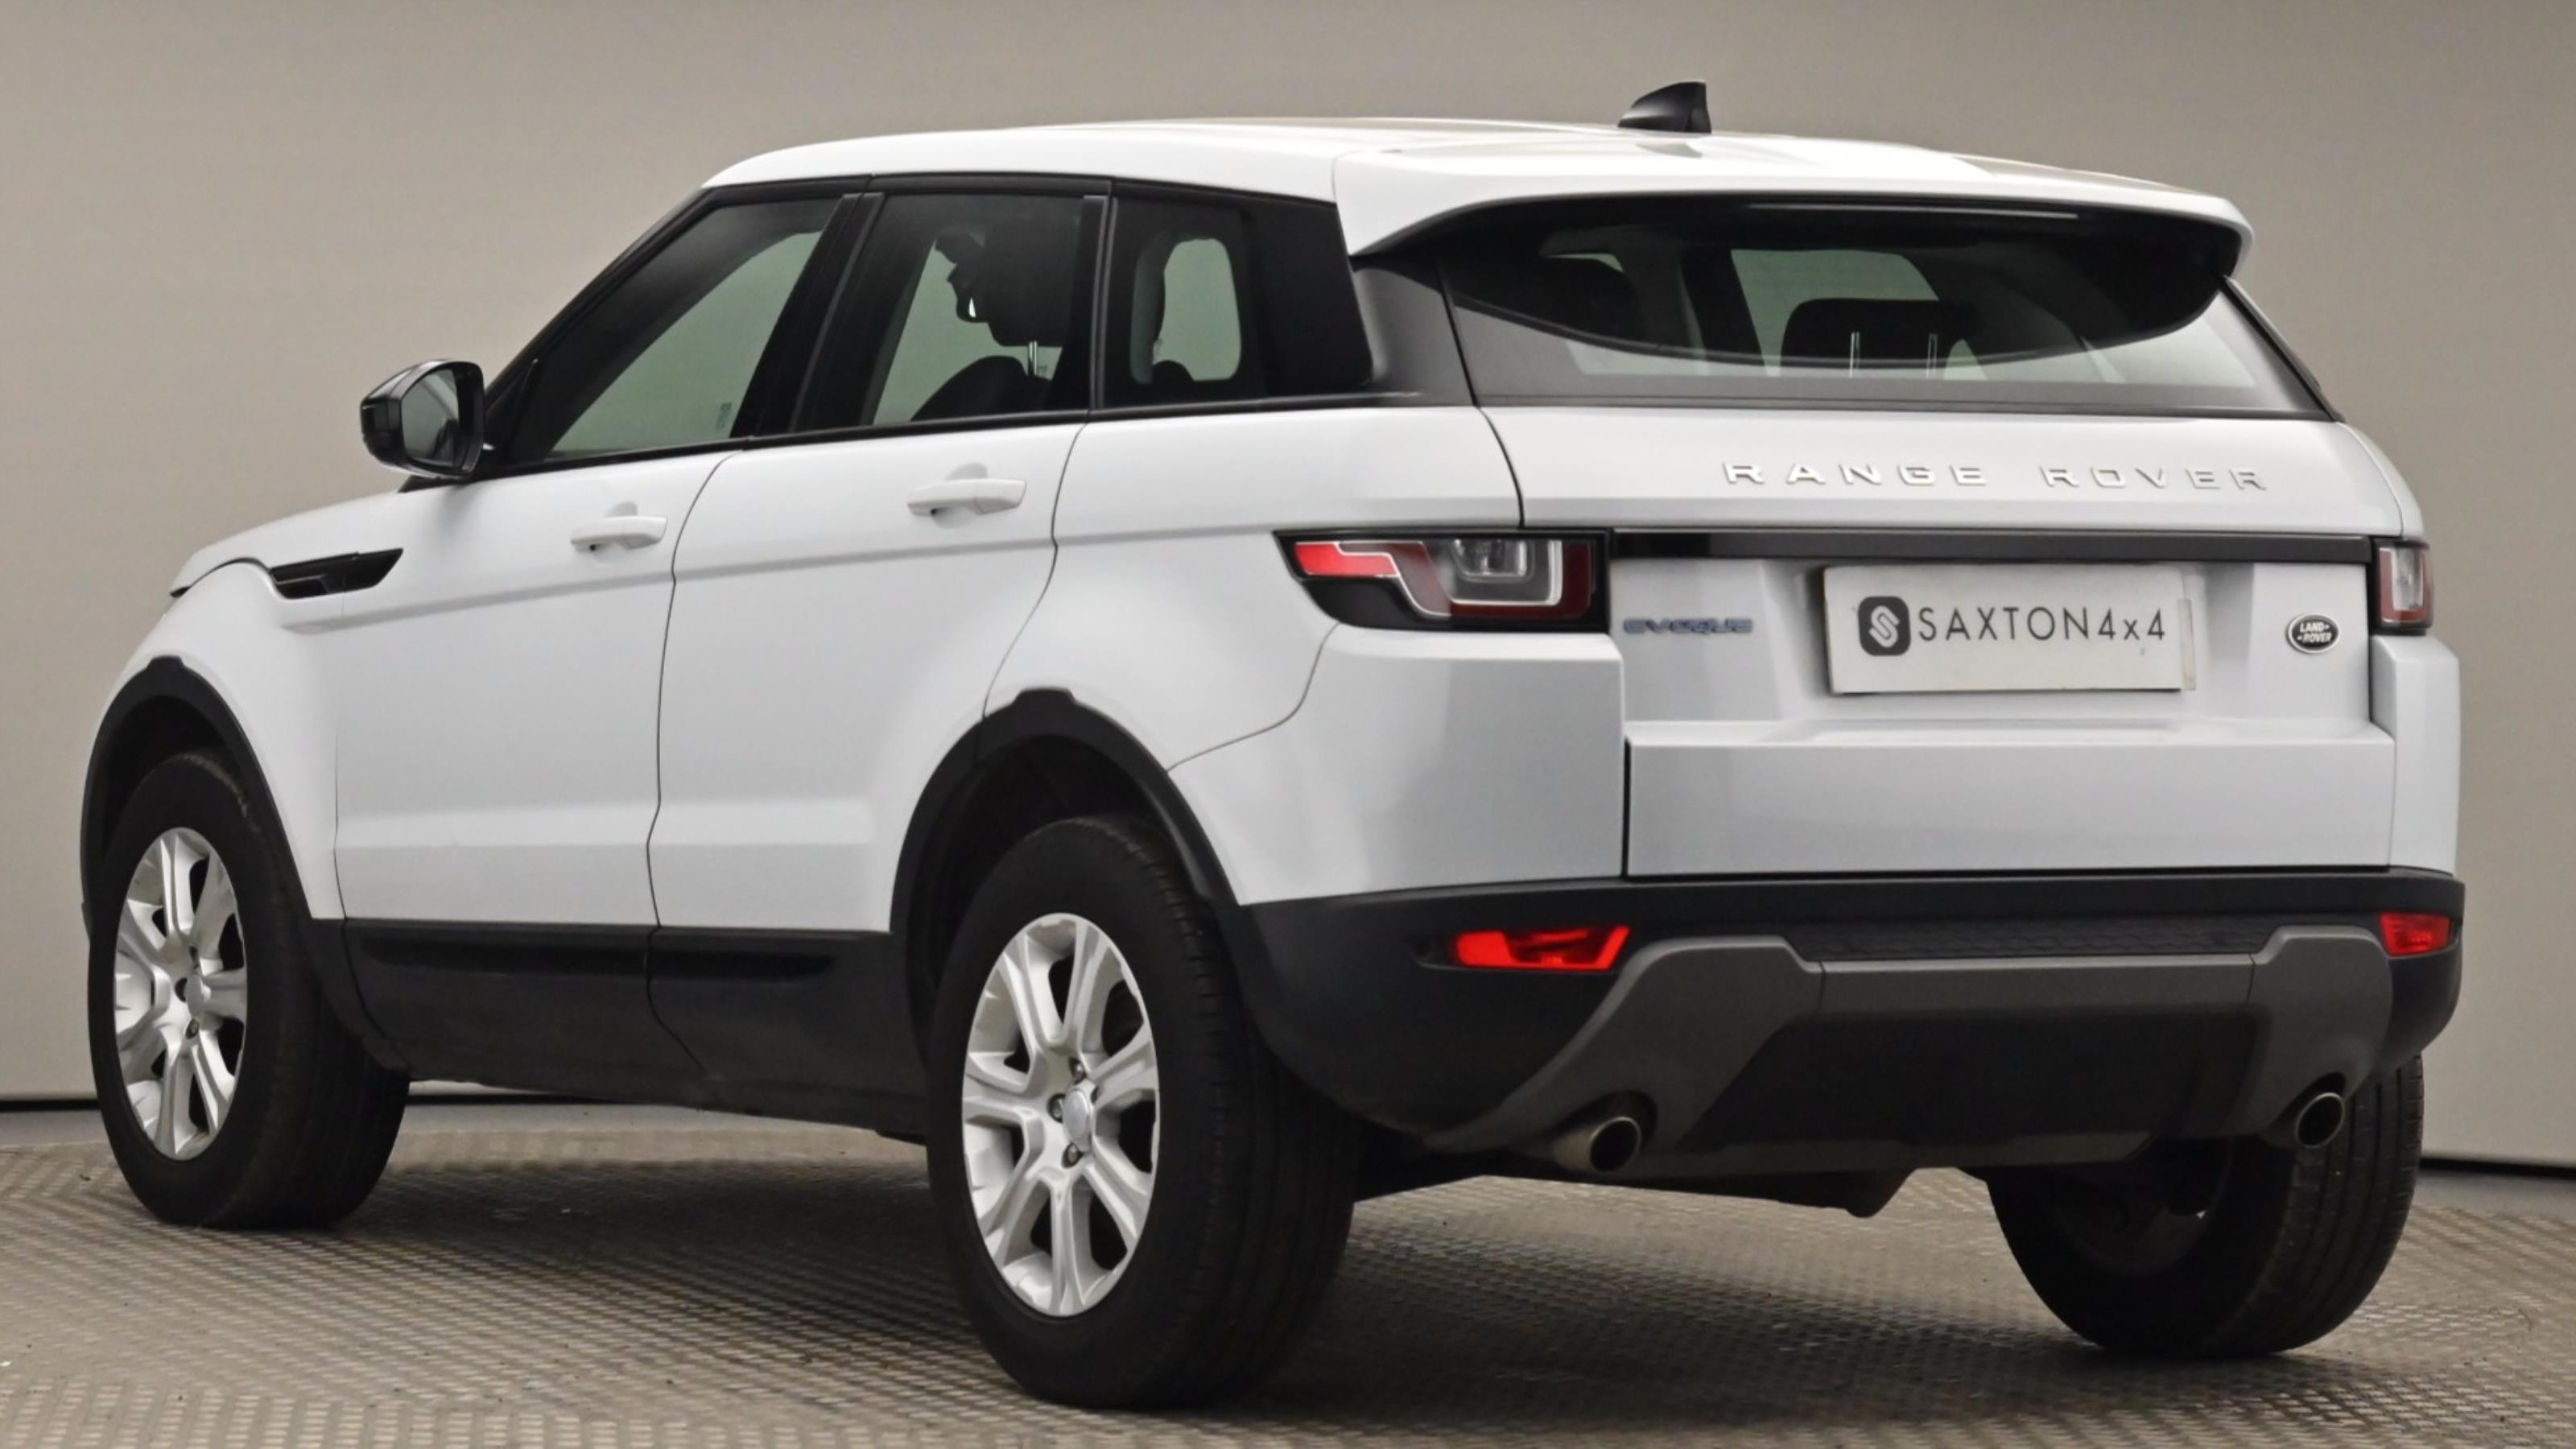 Used 16 Land Rover RANGE ROVER EVOQUE 2.0 eD4 SE Tech 5dr 2WD WHITE at Saxton4x4